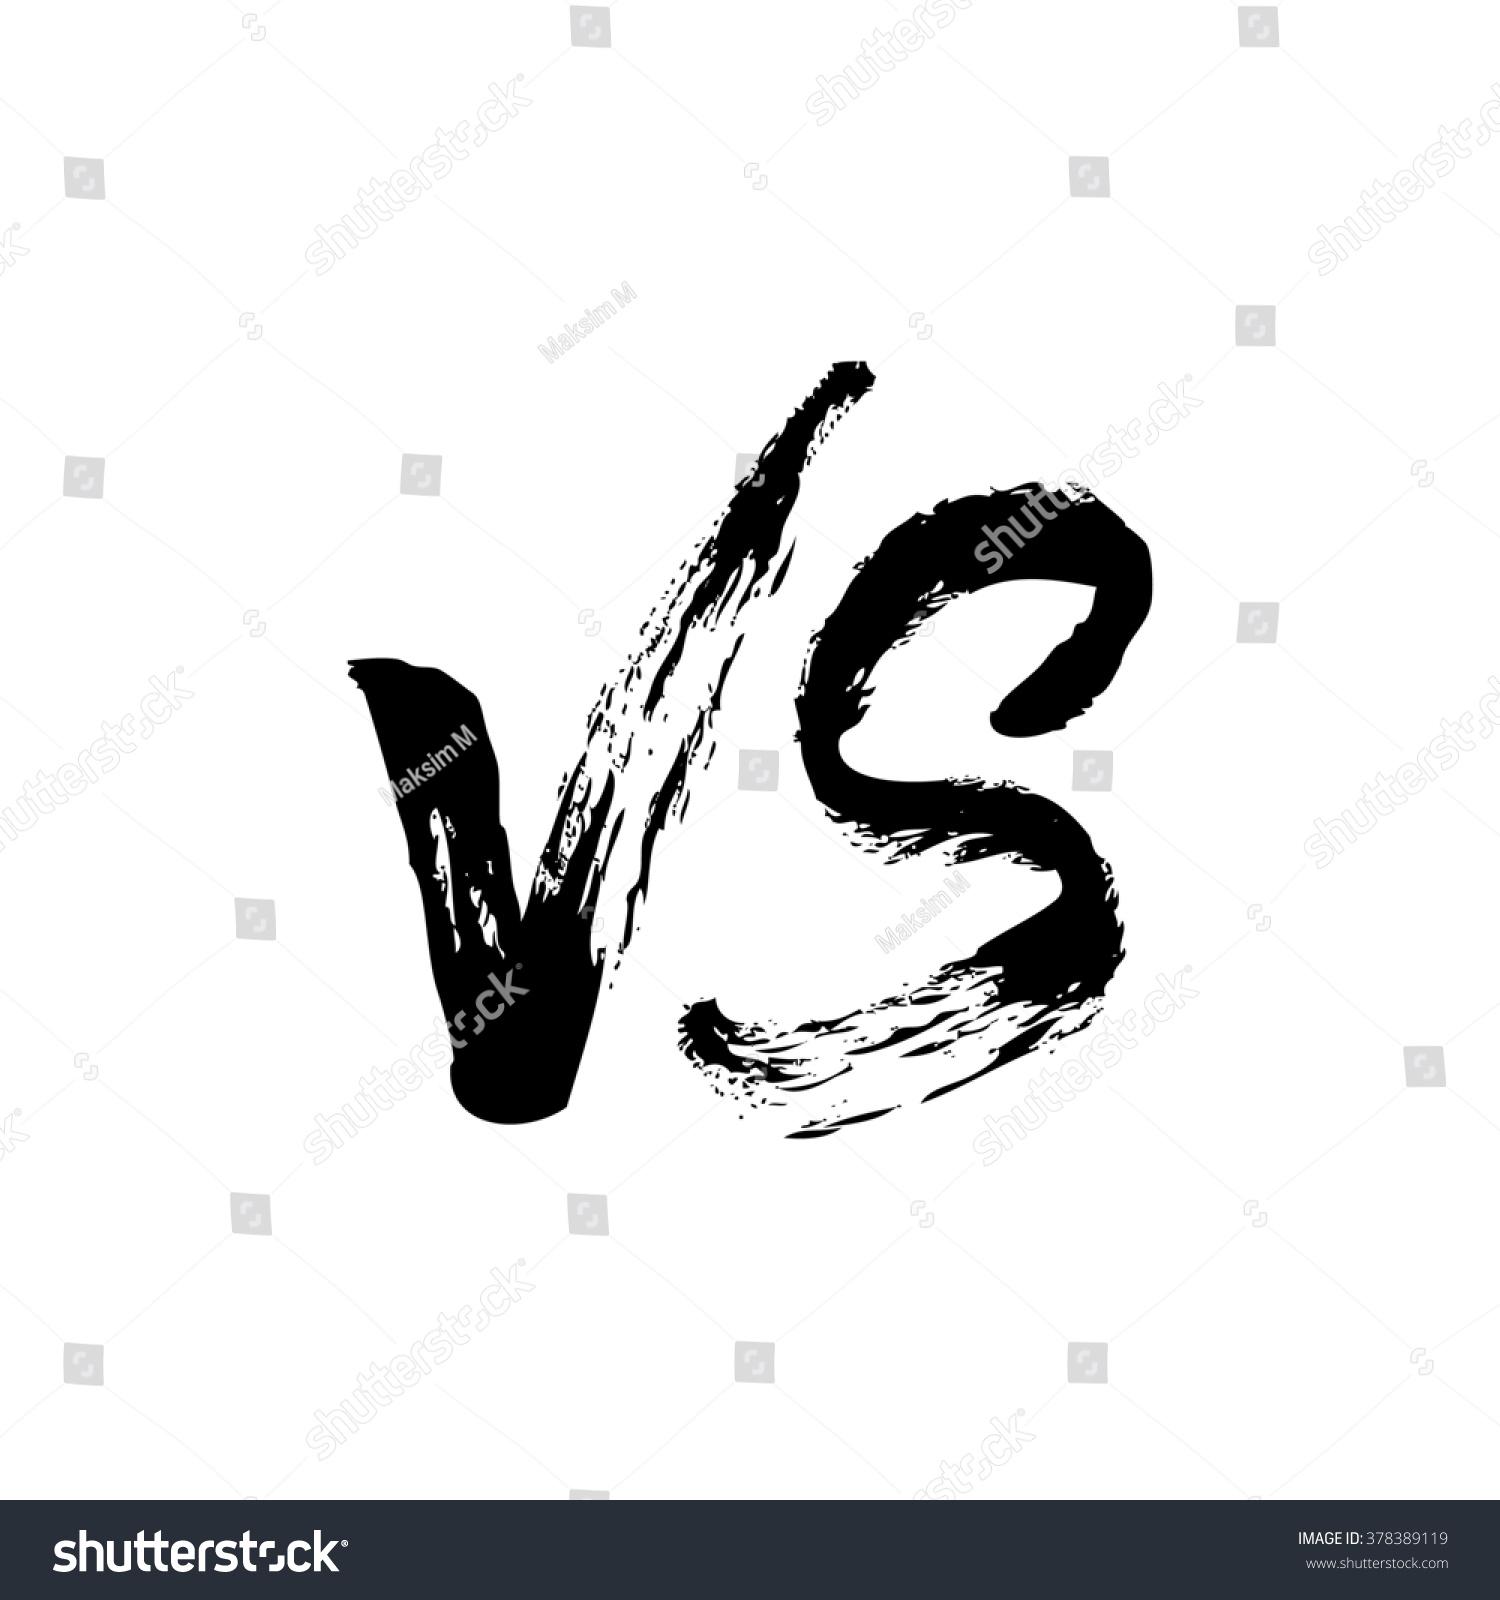 versus logo vs logo versus icon stock illustration